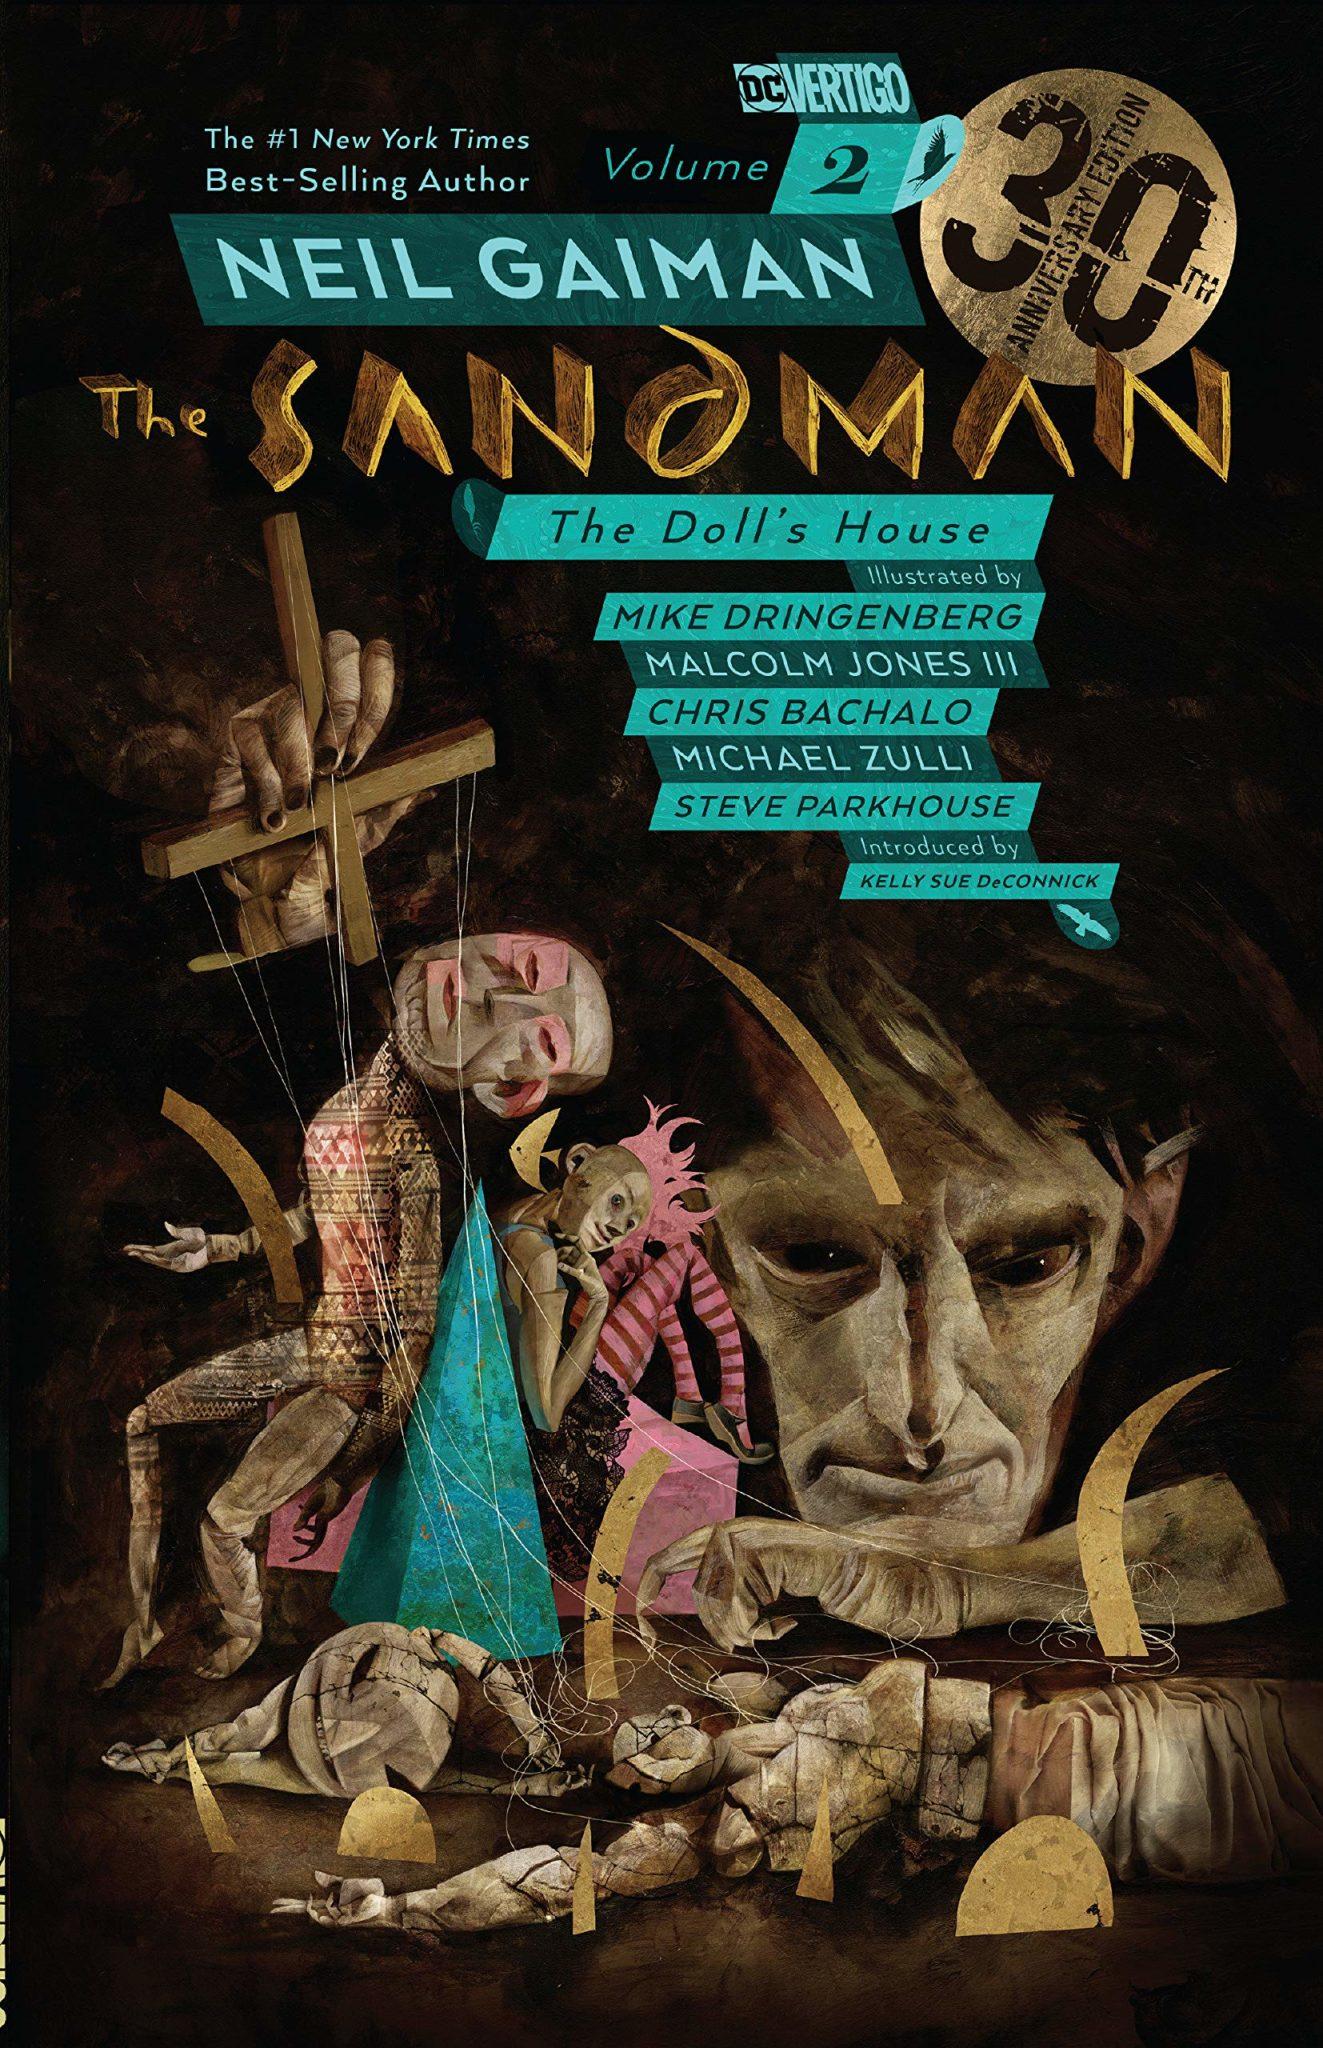 Neil Gaiman books 4